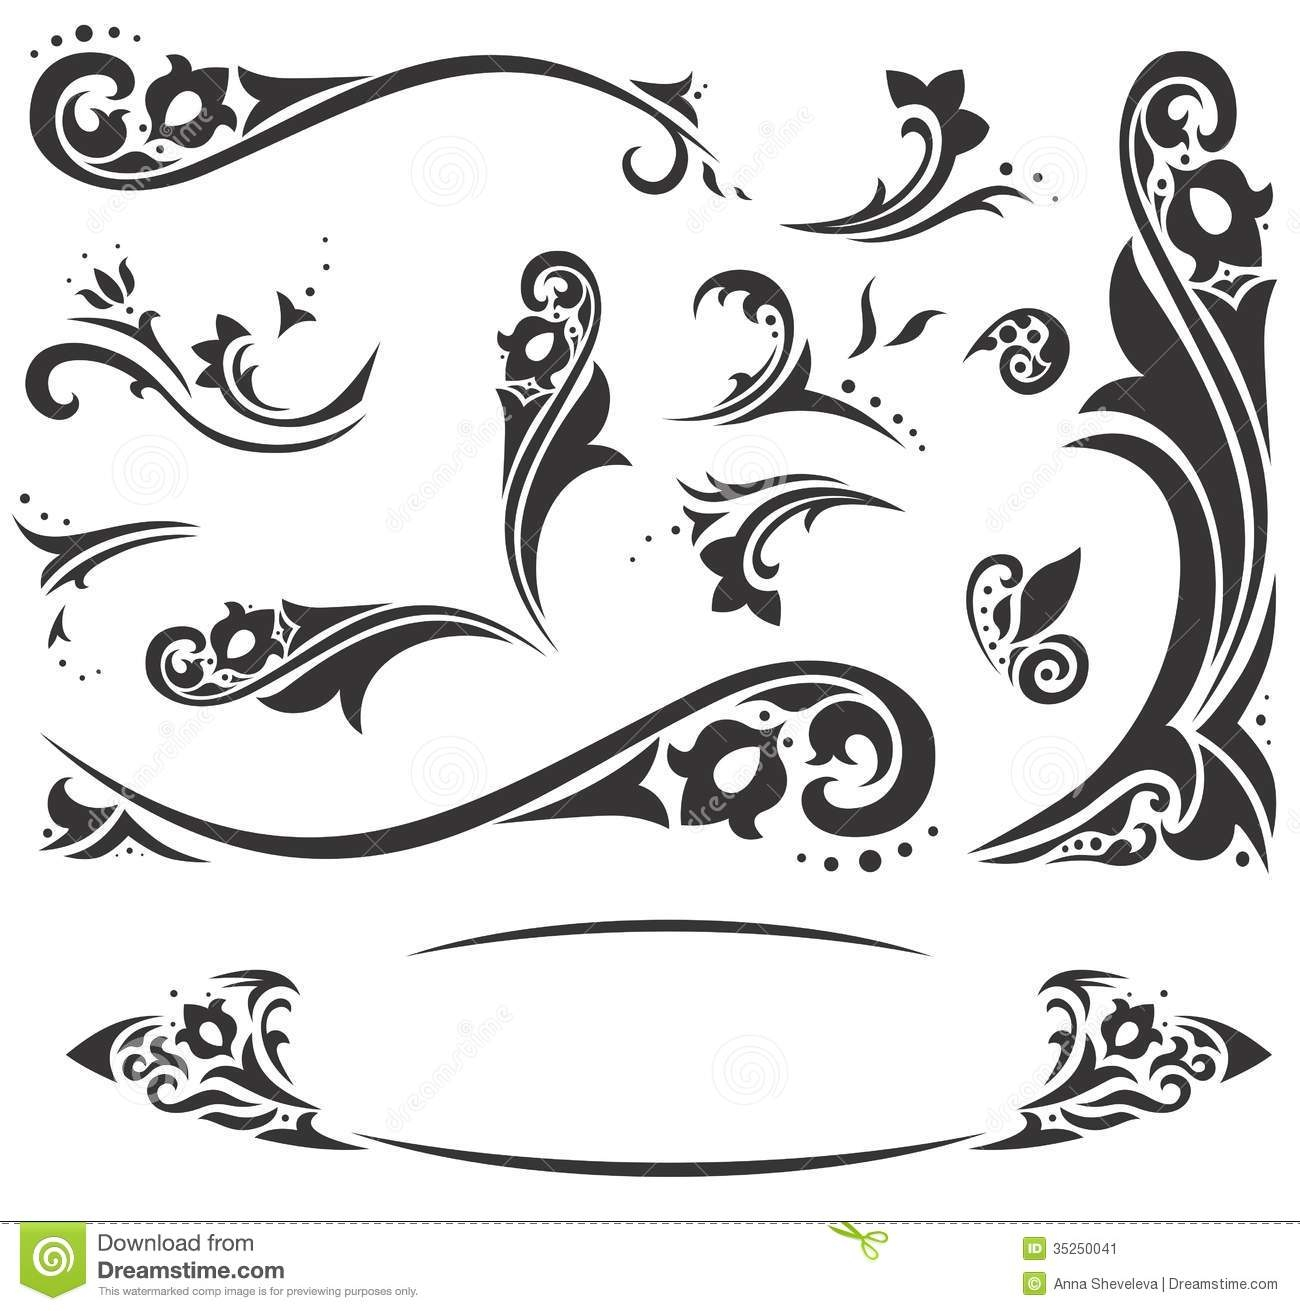 Decoration clipart islamic wedding Clipart Wedding clipartsgram Muslim com